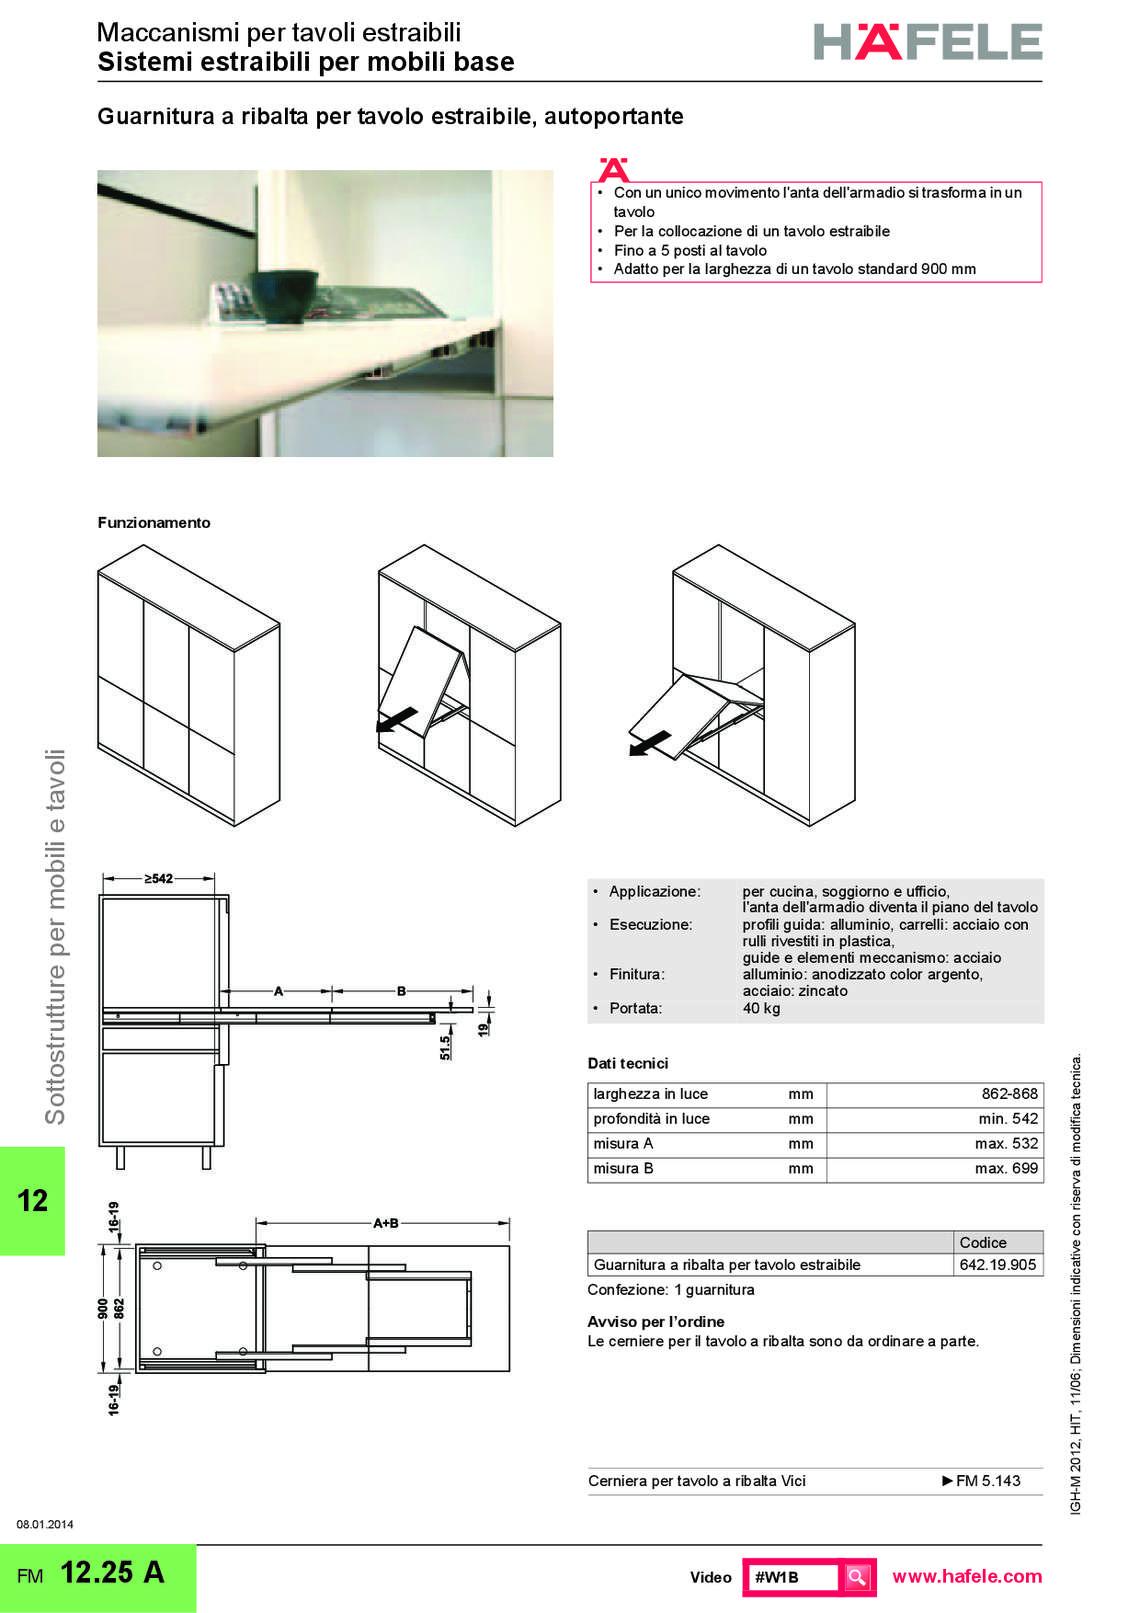 hafele-sottostrutture-per-mobili_83_042.jpg